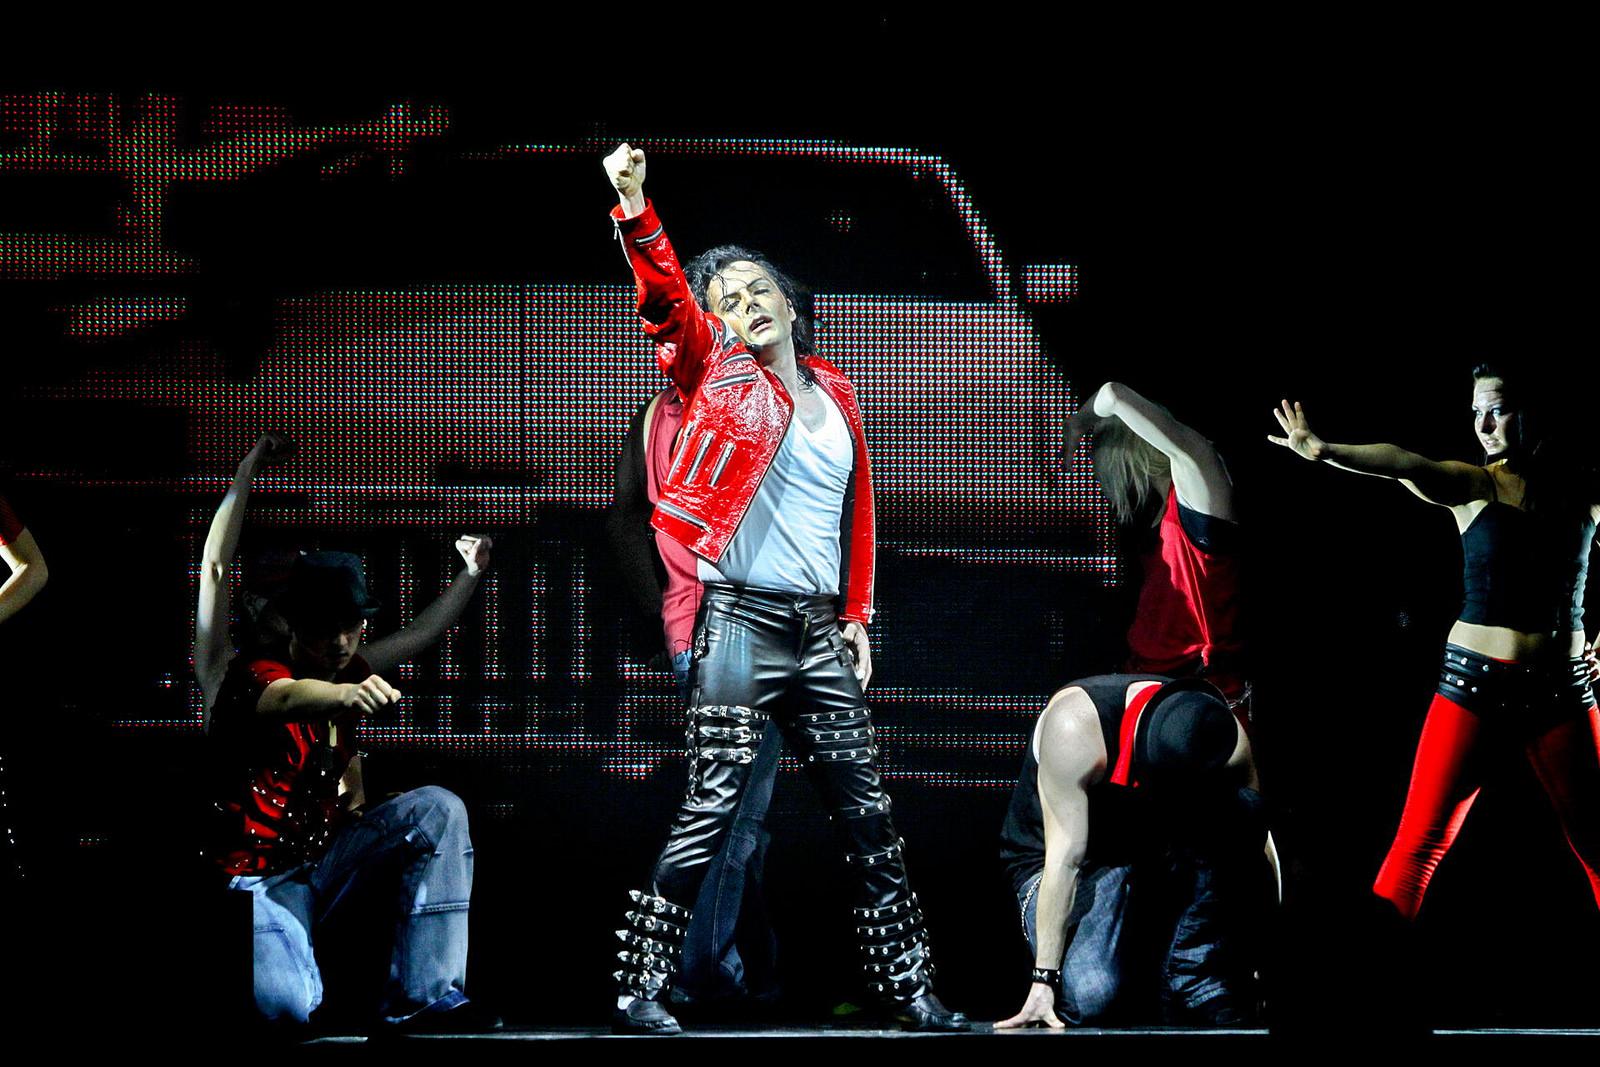 Etnapolis, grande festa per Michael Jackson